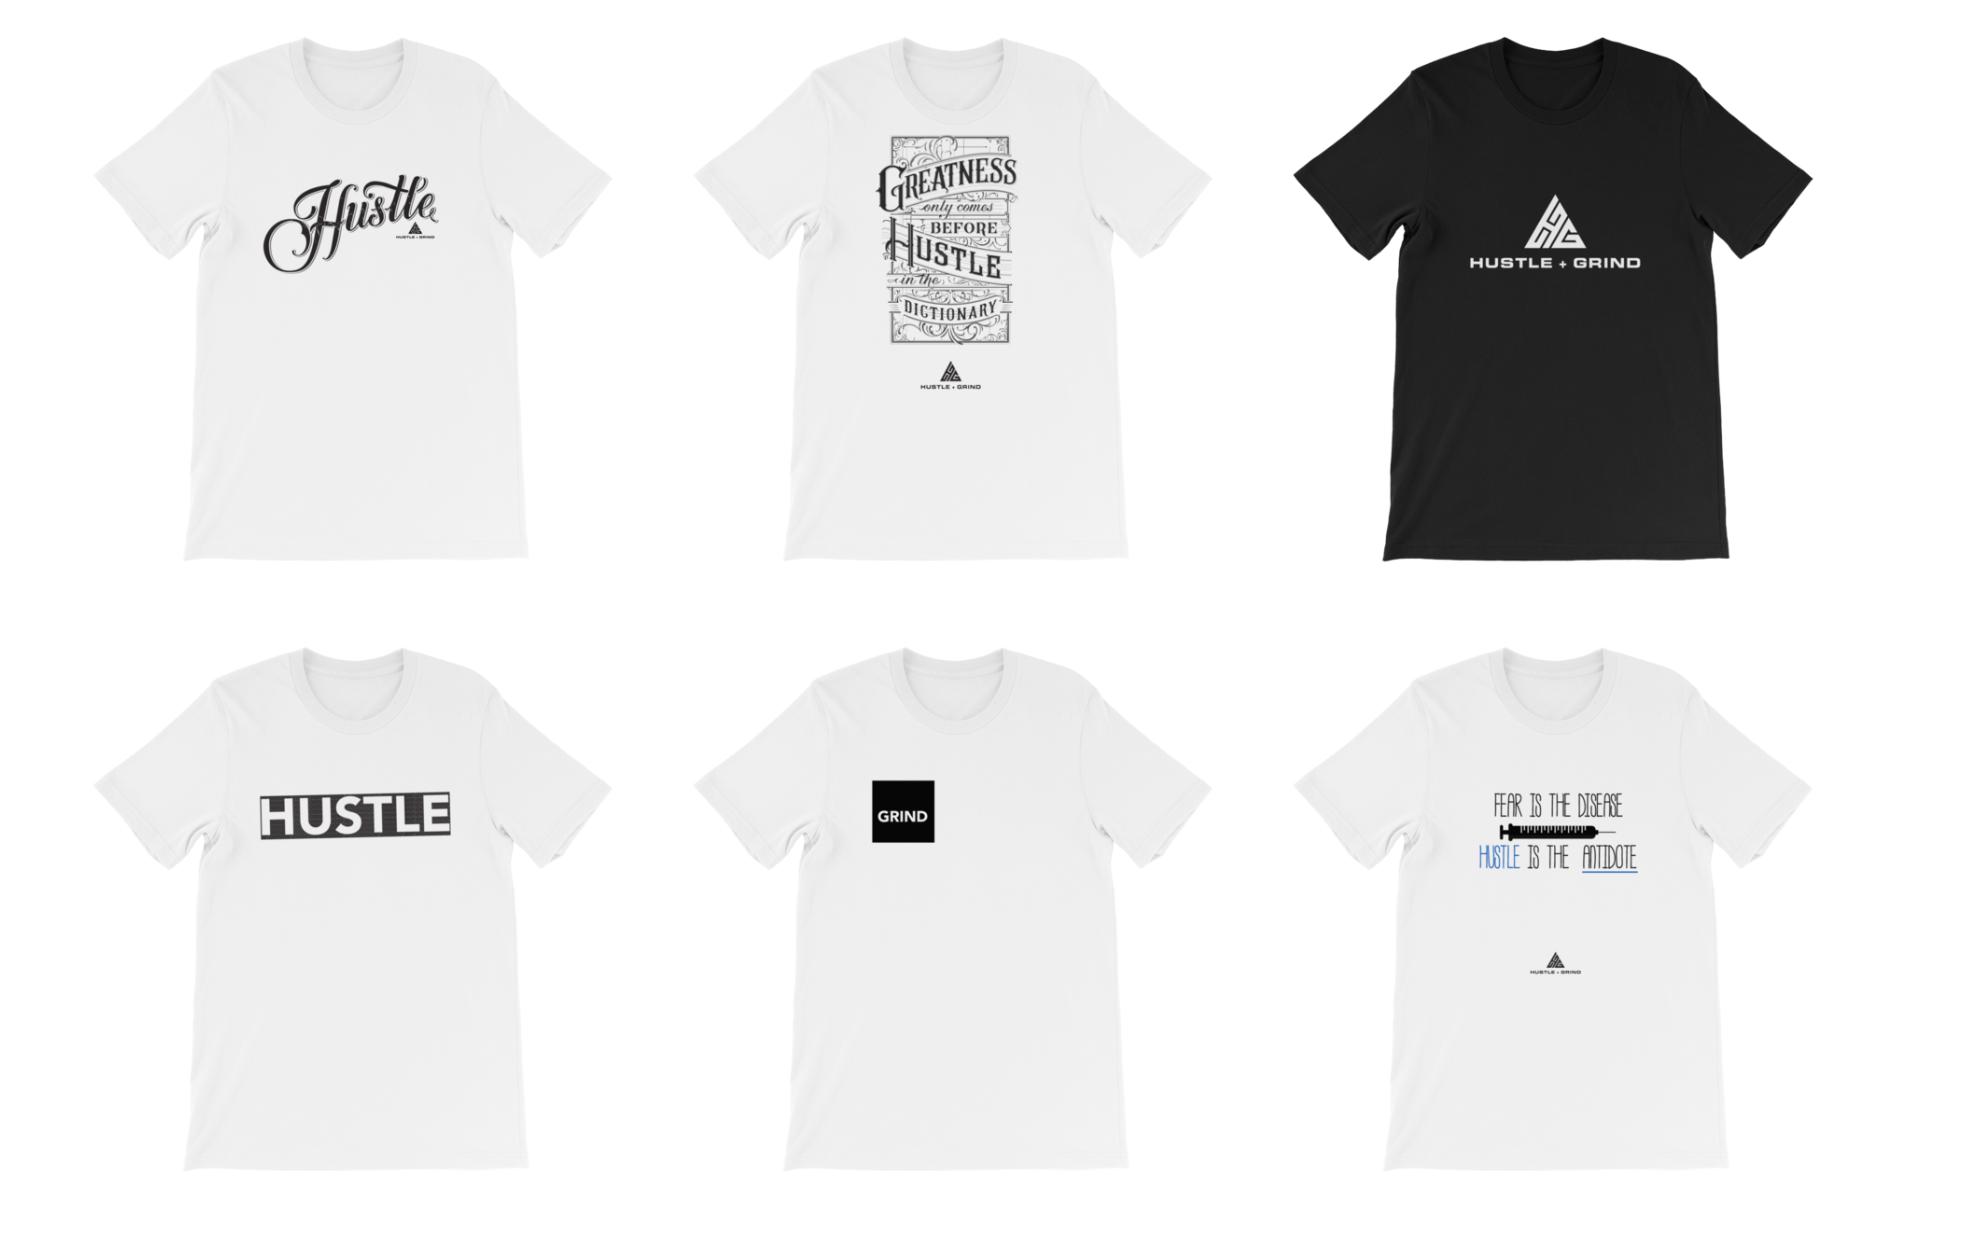 hustle grind tshirts.jpg